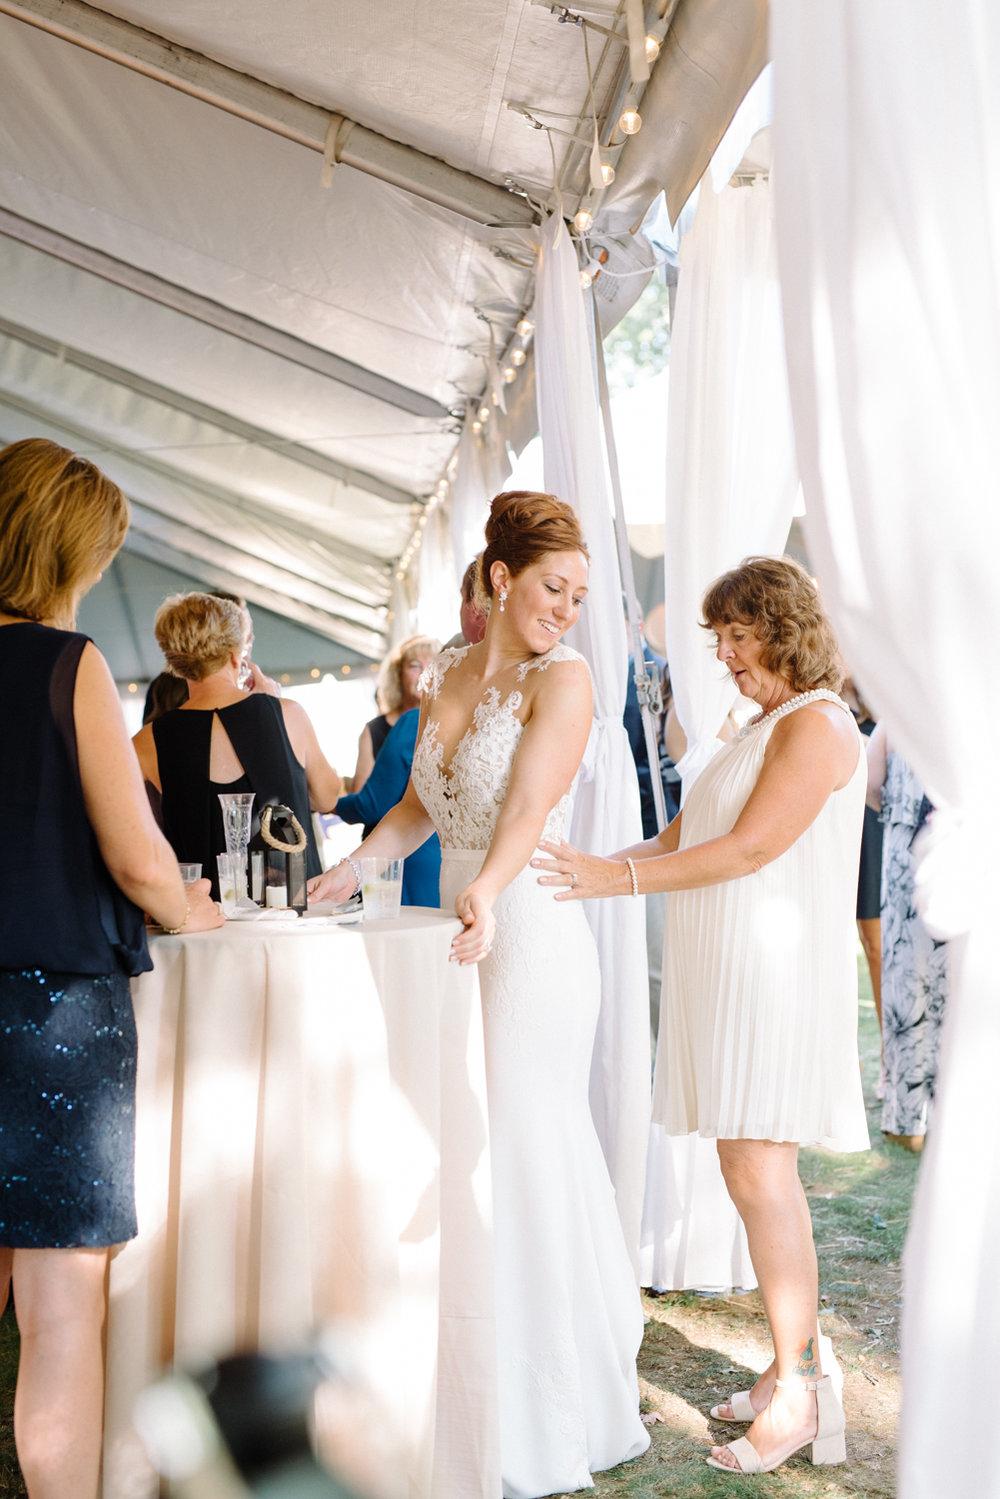 Lauren+AJ- DIY Backyard Wedding- New Jersey- Olivia Christina Photo-345.JPG